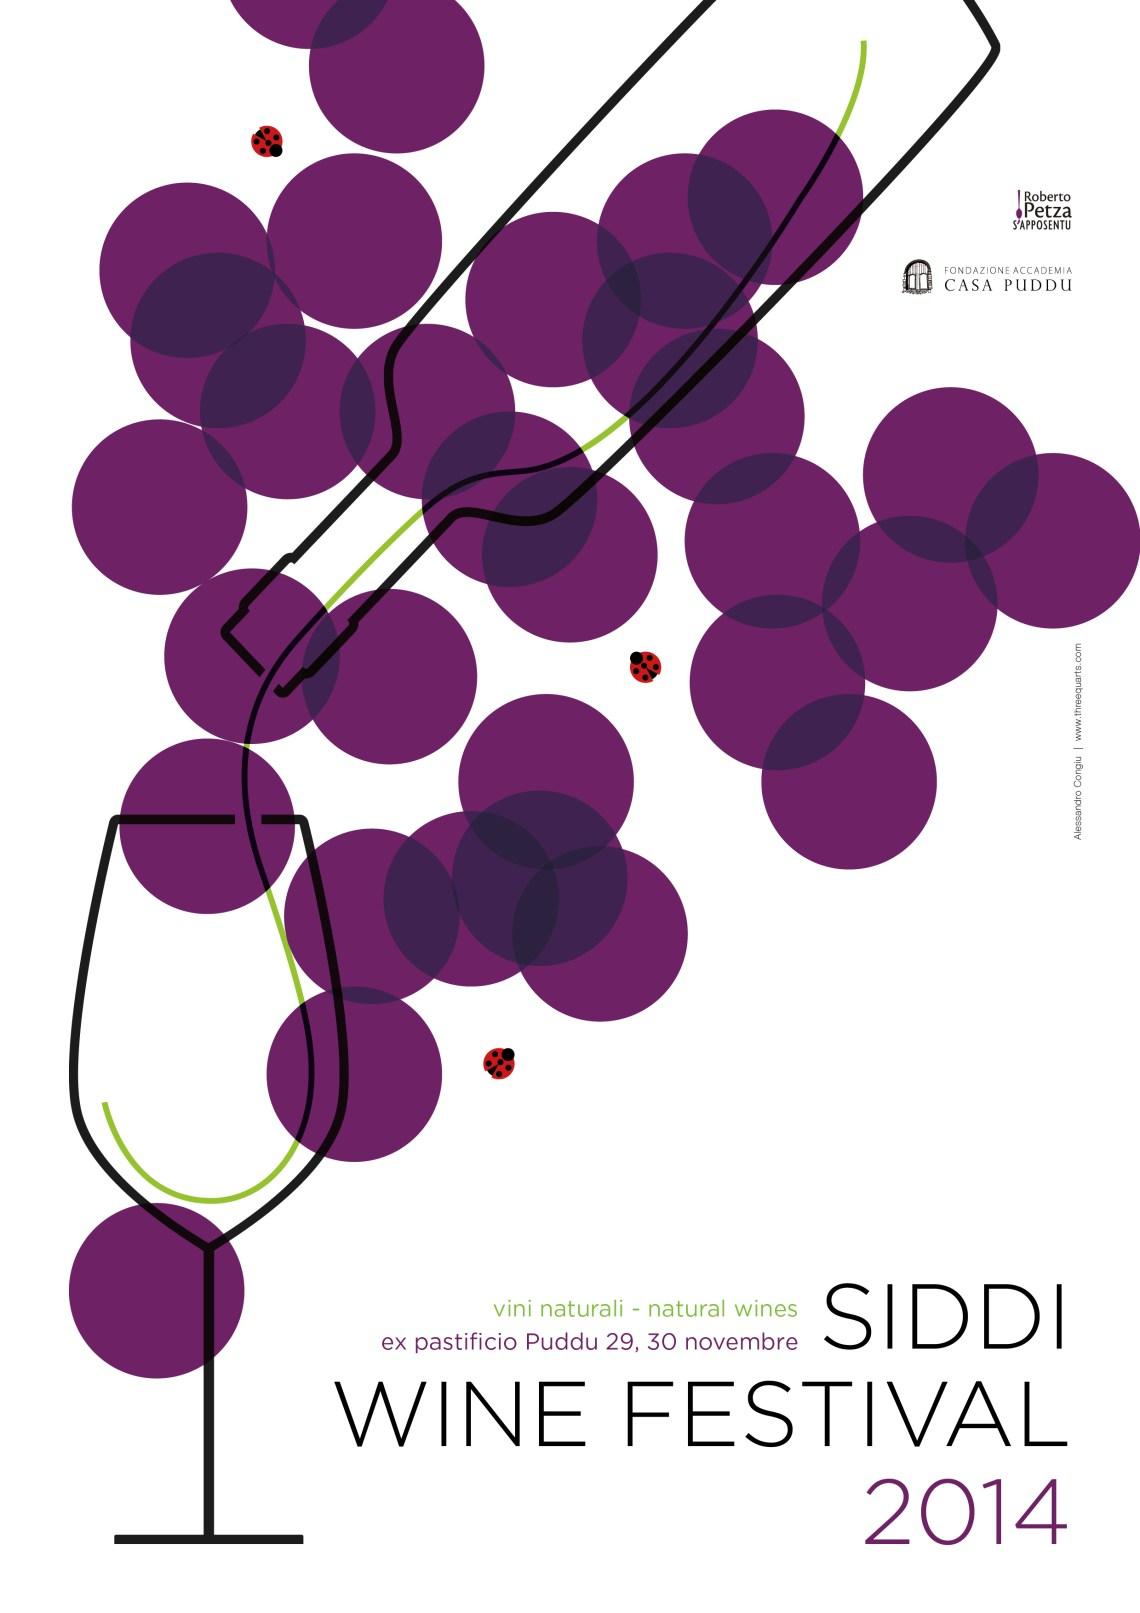 siddi wine festival 2014